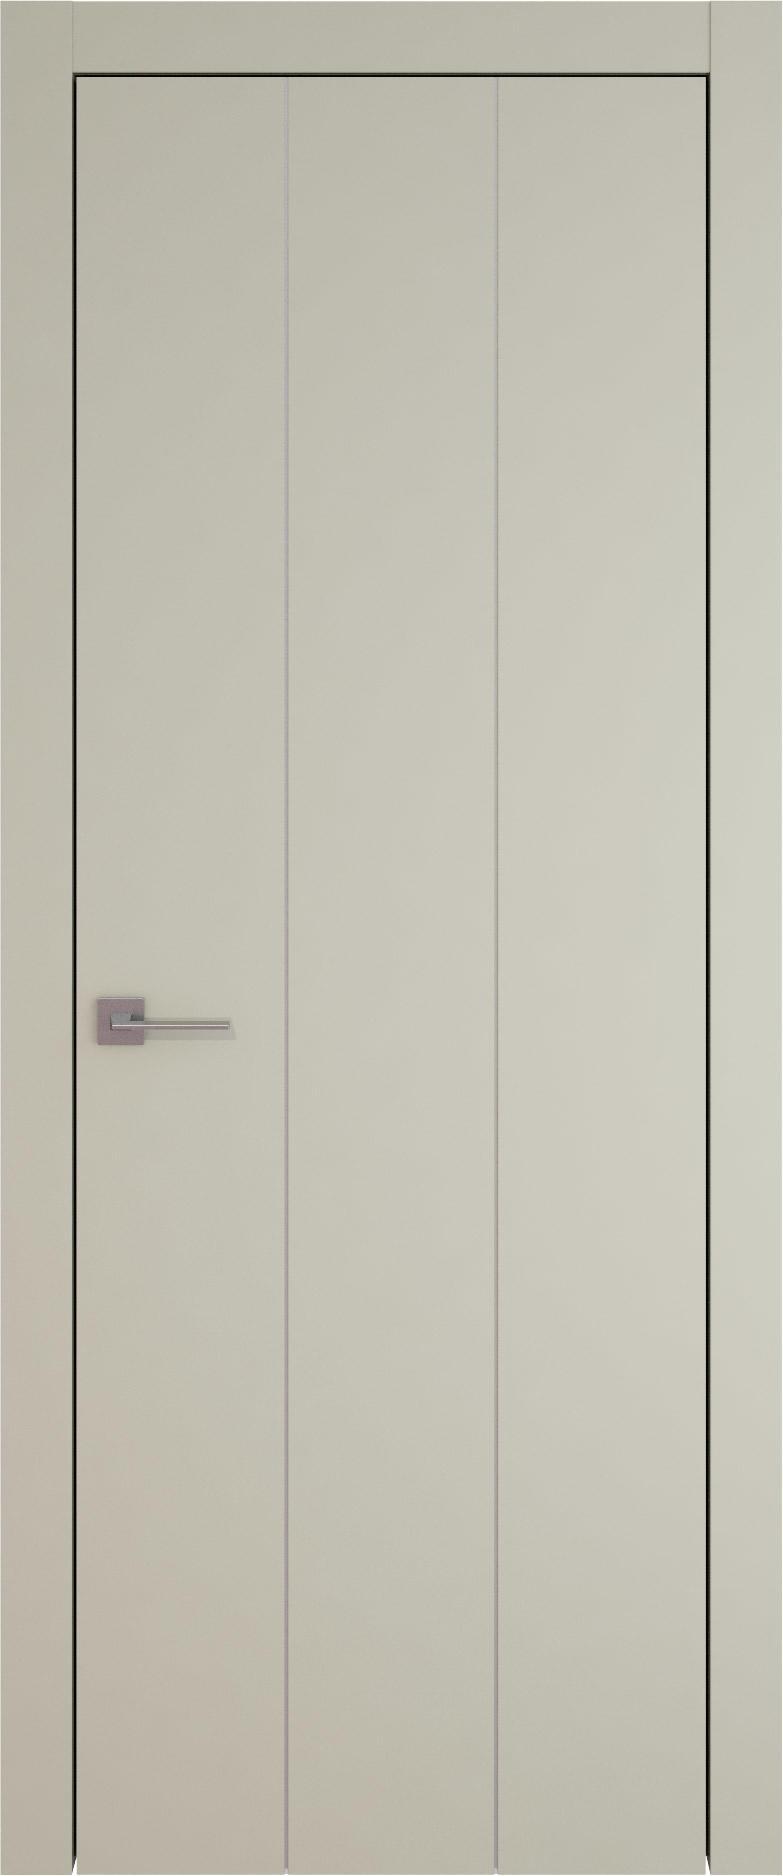 Tivoli Б-1 цвет - Серо-оливковая эмаль (RAL 7032) Без стекла (ДГ)